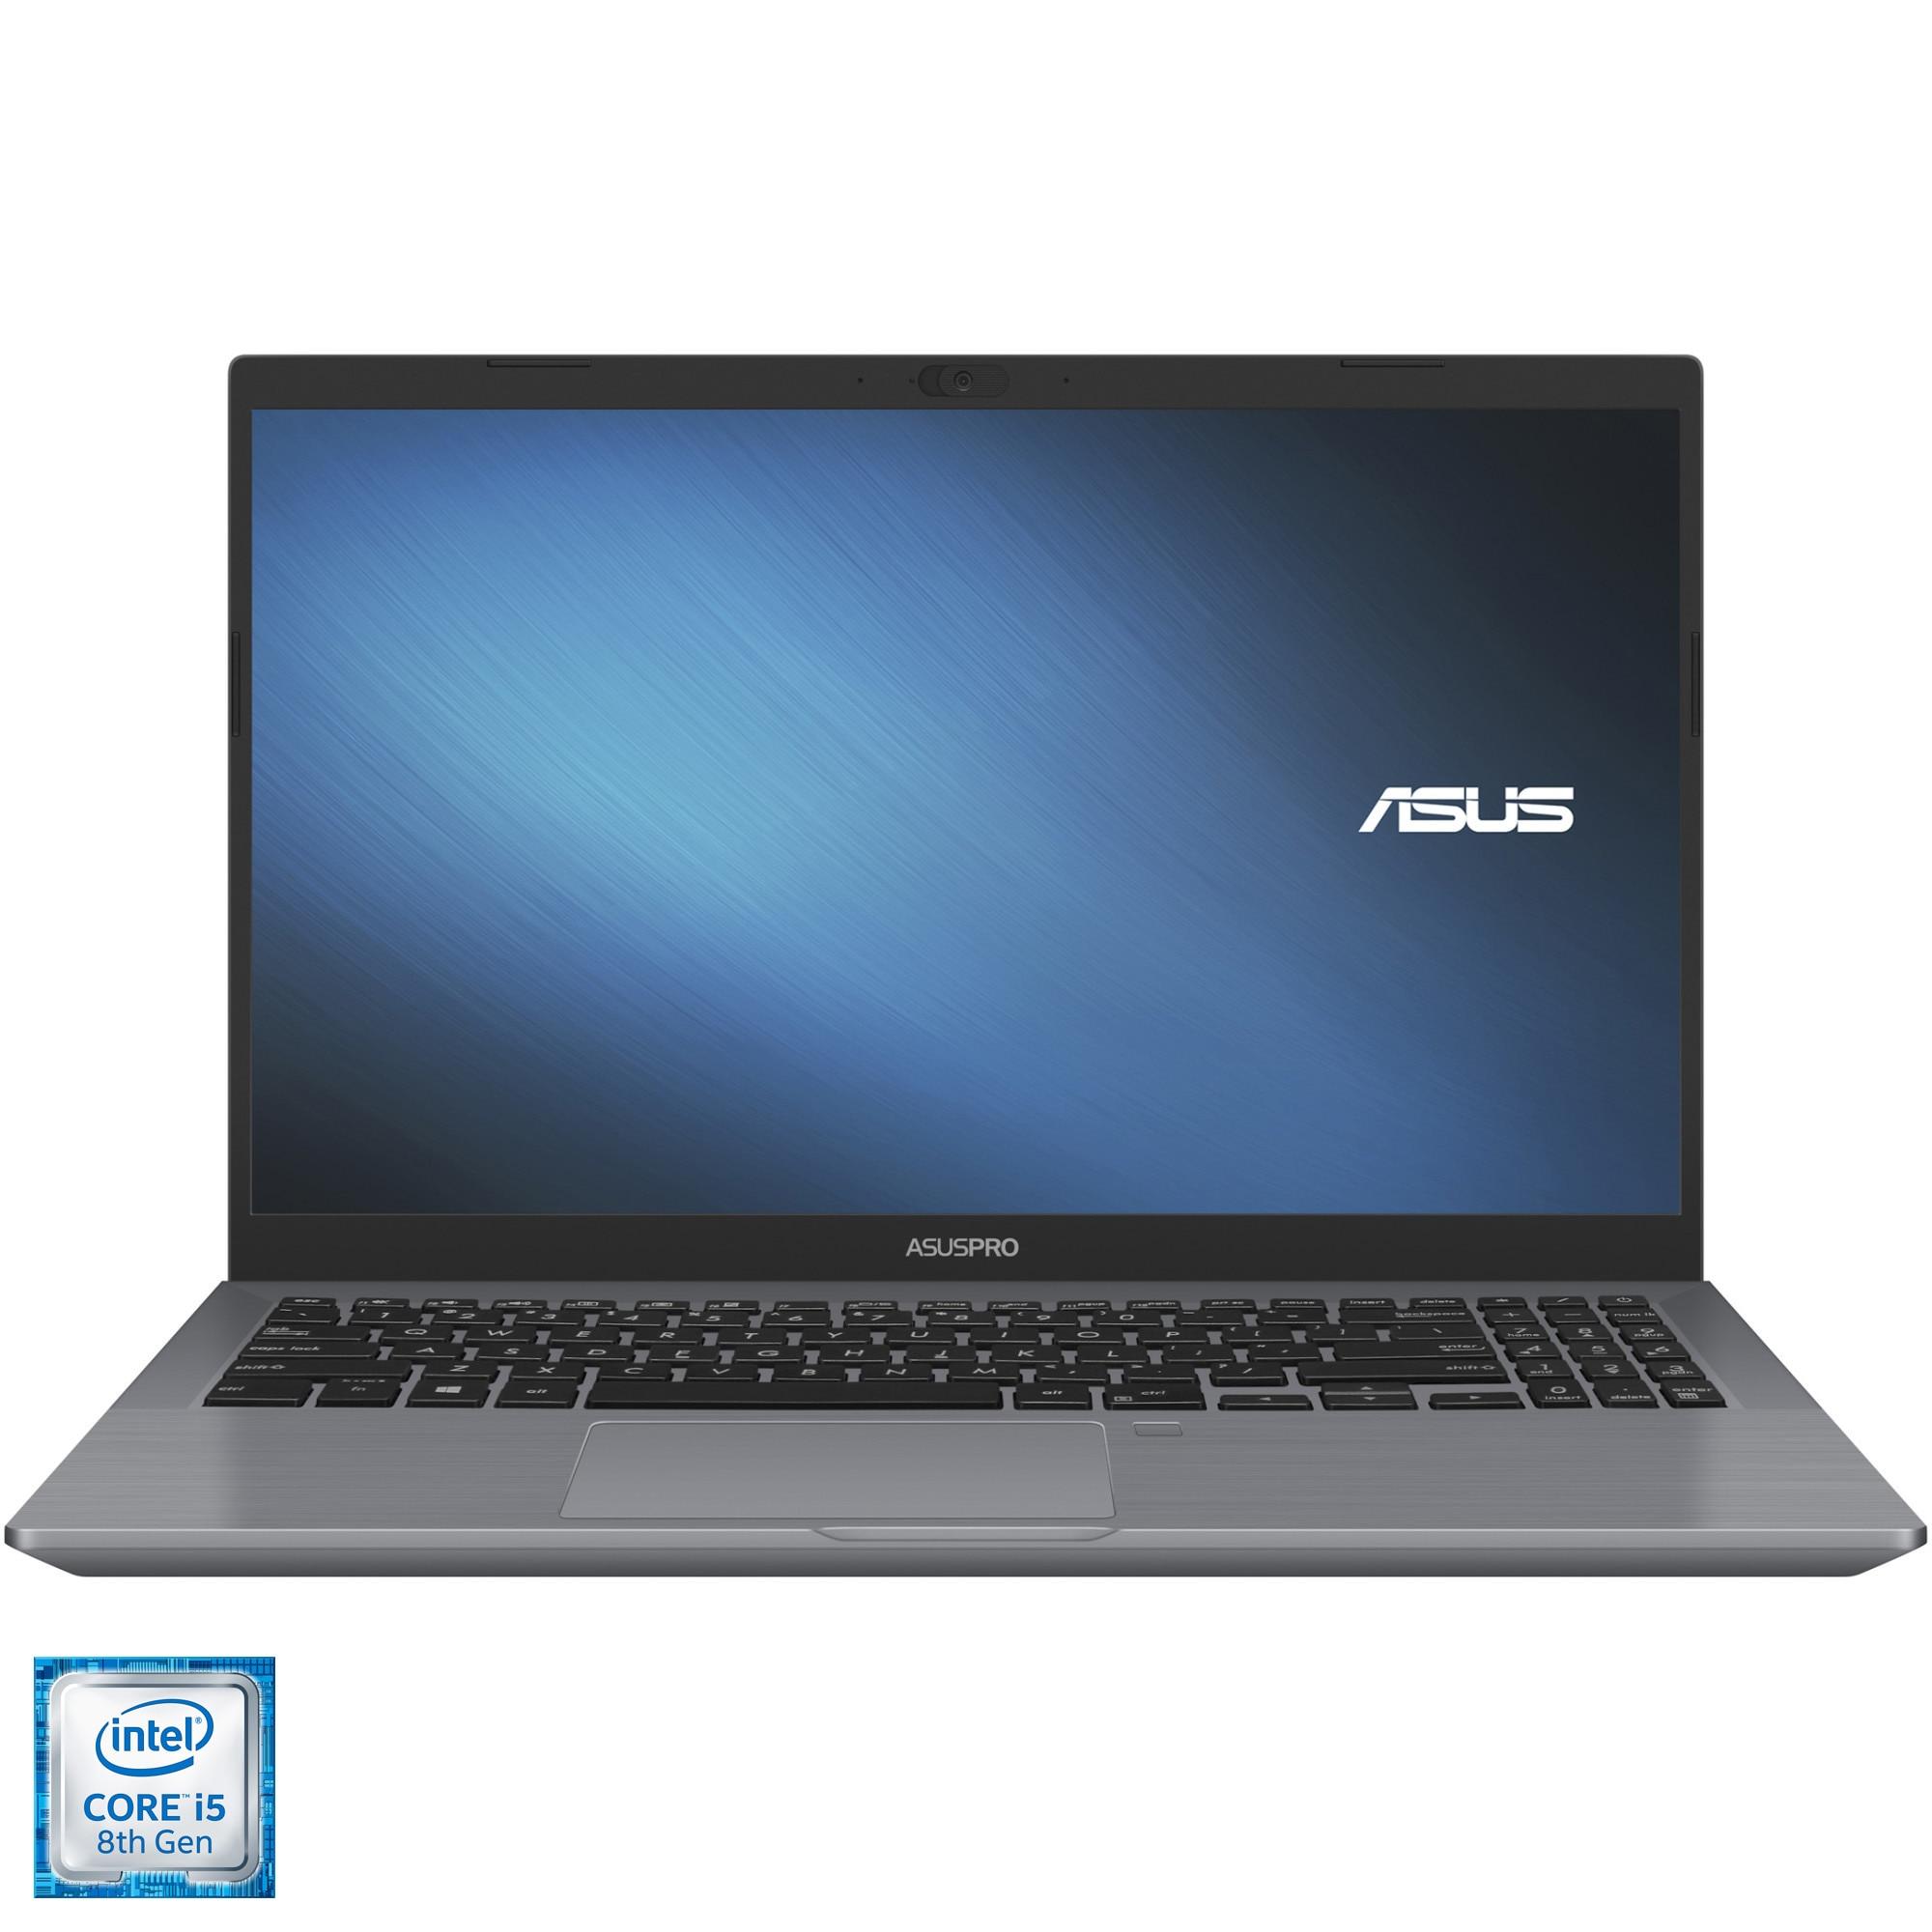 "Fotografie Laptop ASUS AsusPro P3540FA cu procesor Intel® Core™ i5-8265U pana la 3.90 GHz Whiskey Lake, 15.6"", Full HD, 8GB, 512GB SSD, Intel UHD Graphics 630, Endless OS, Grey"